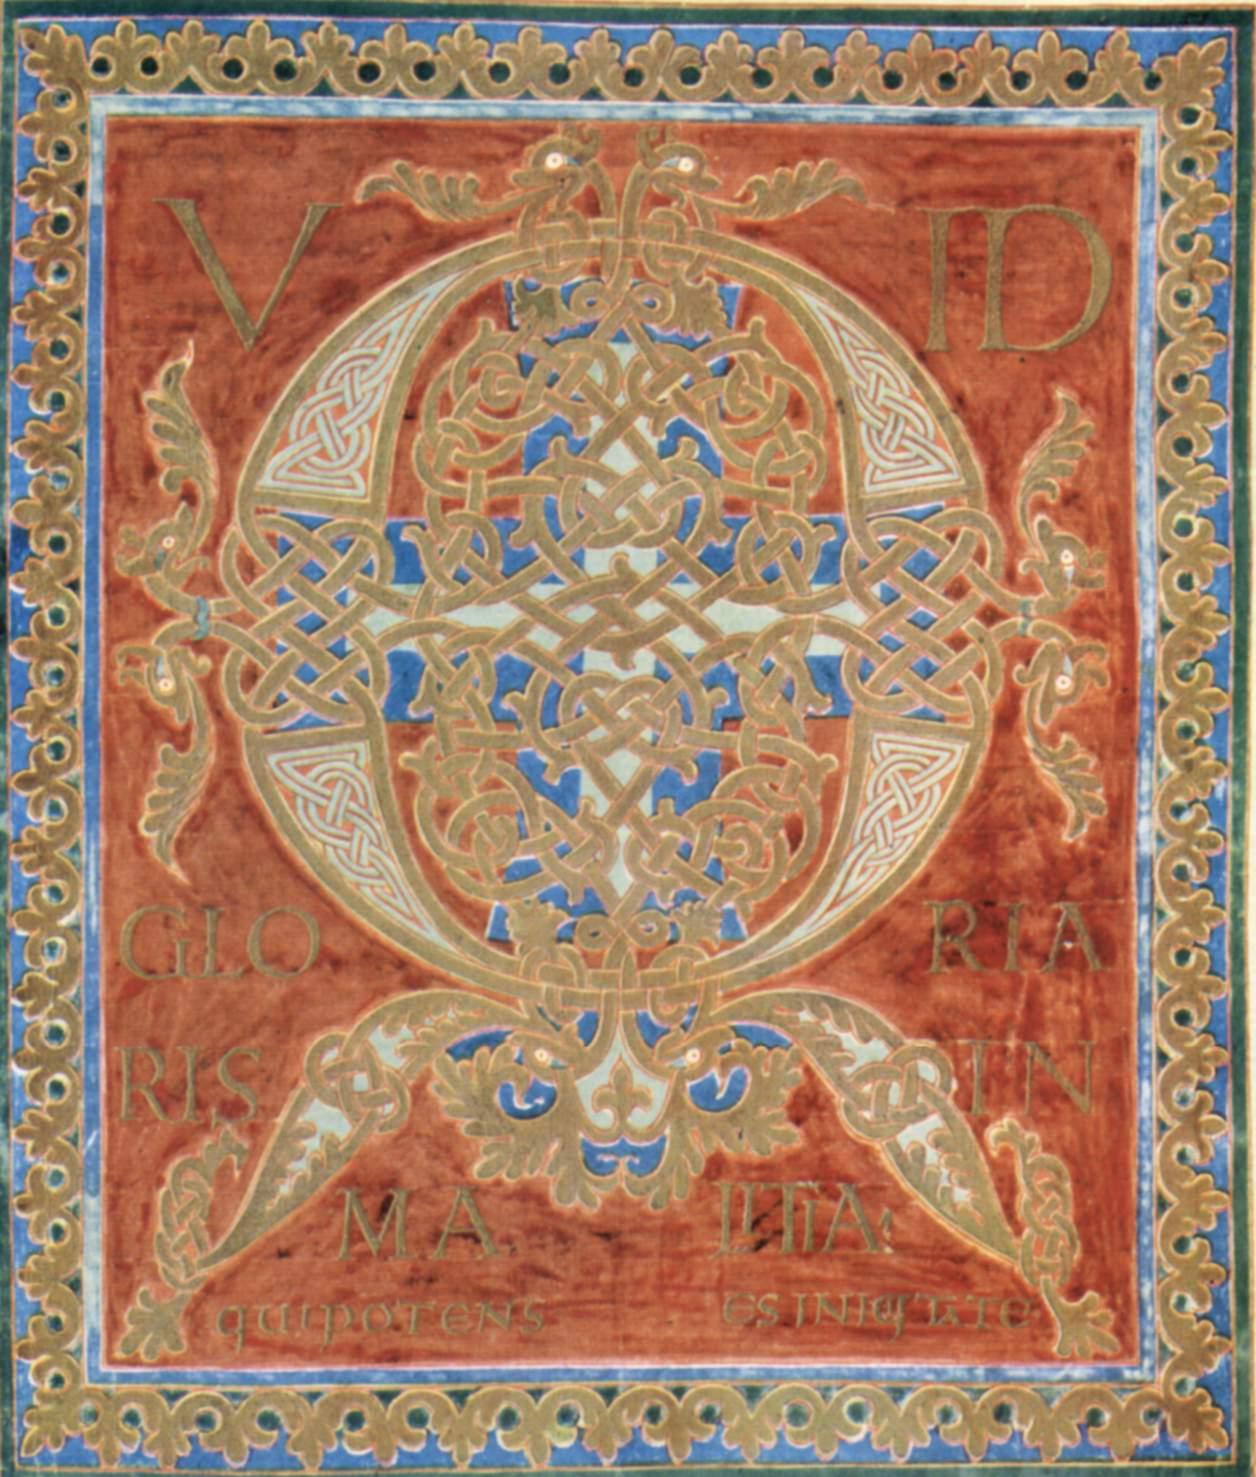 9th century illustration